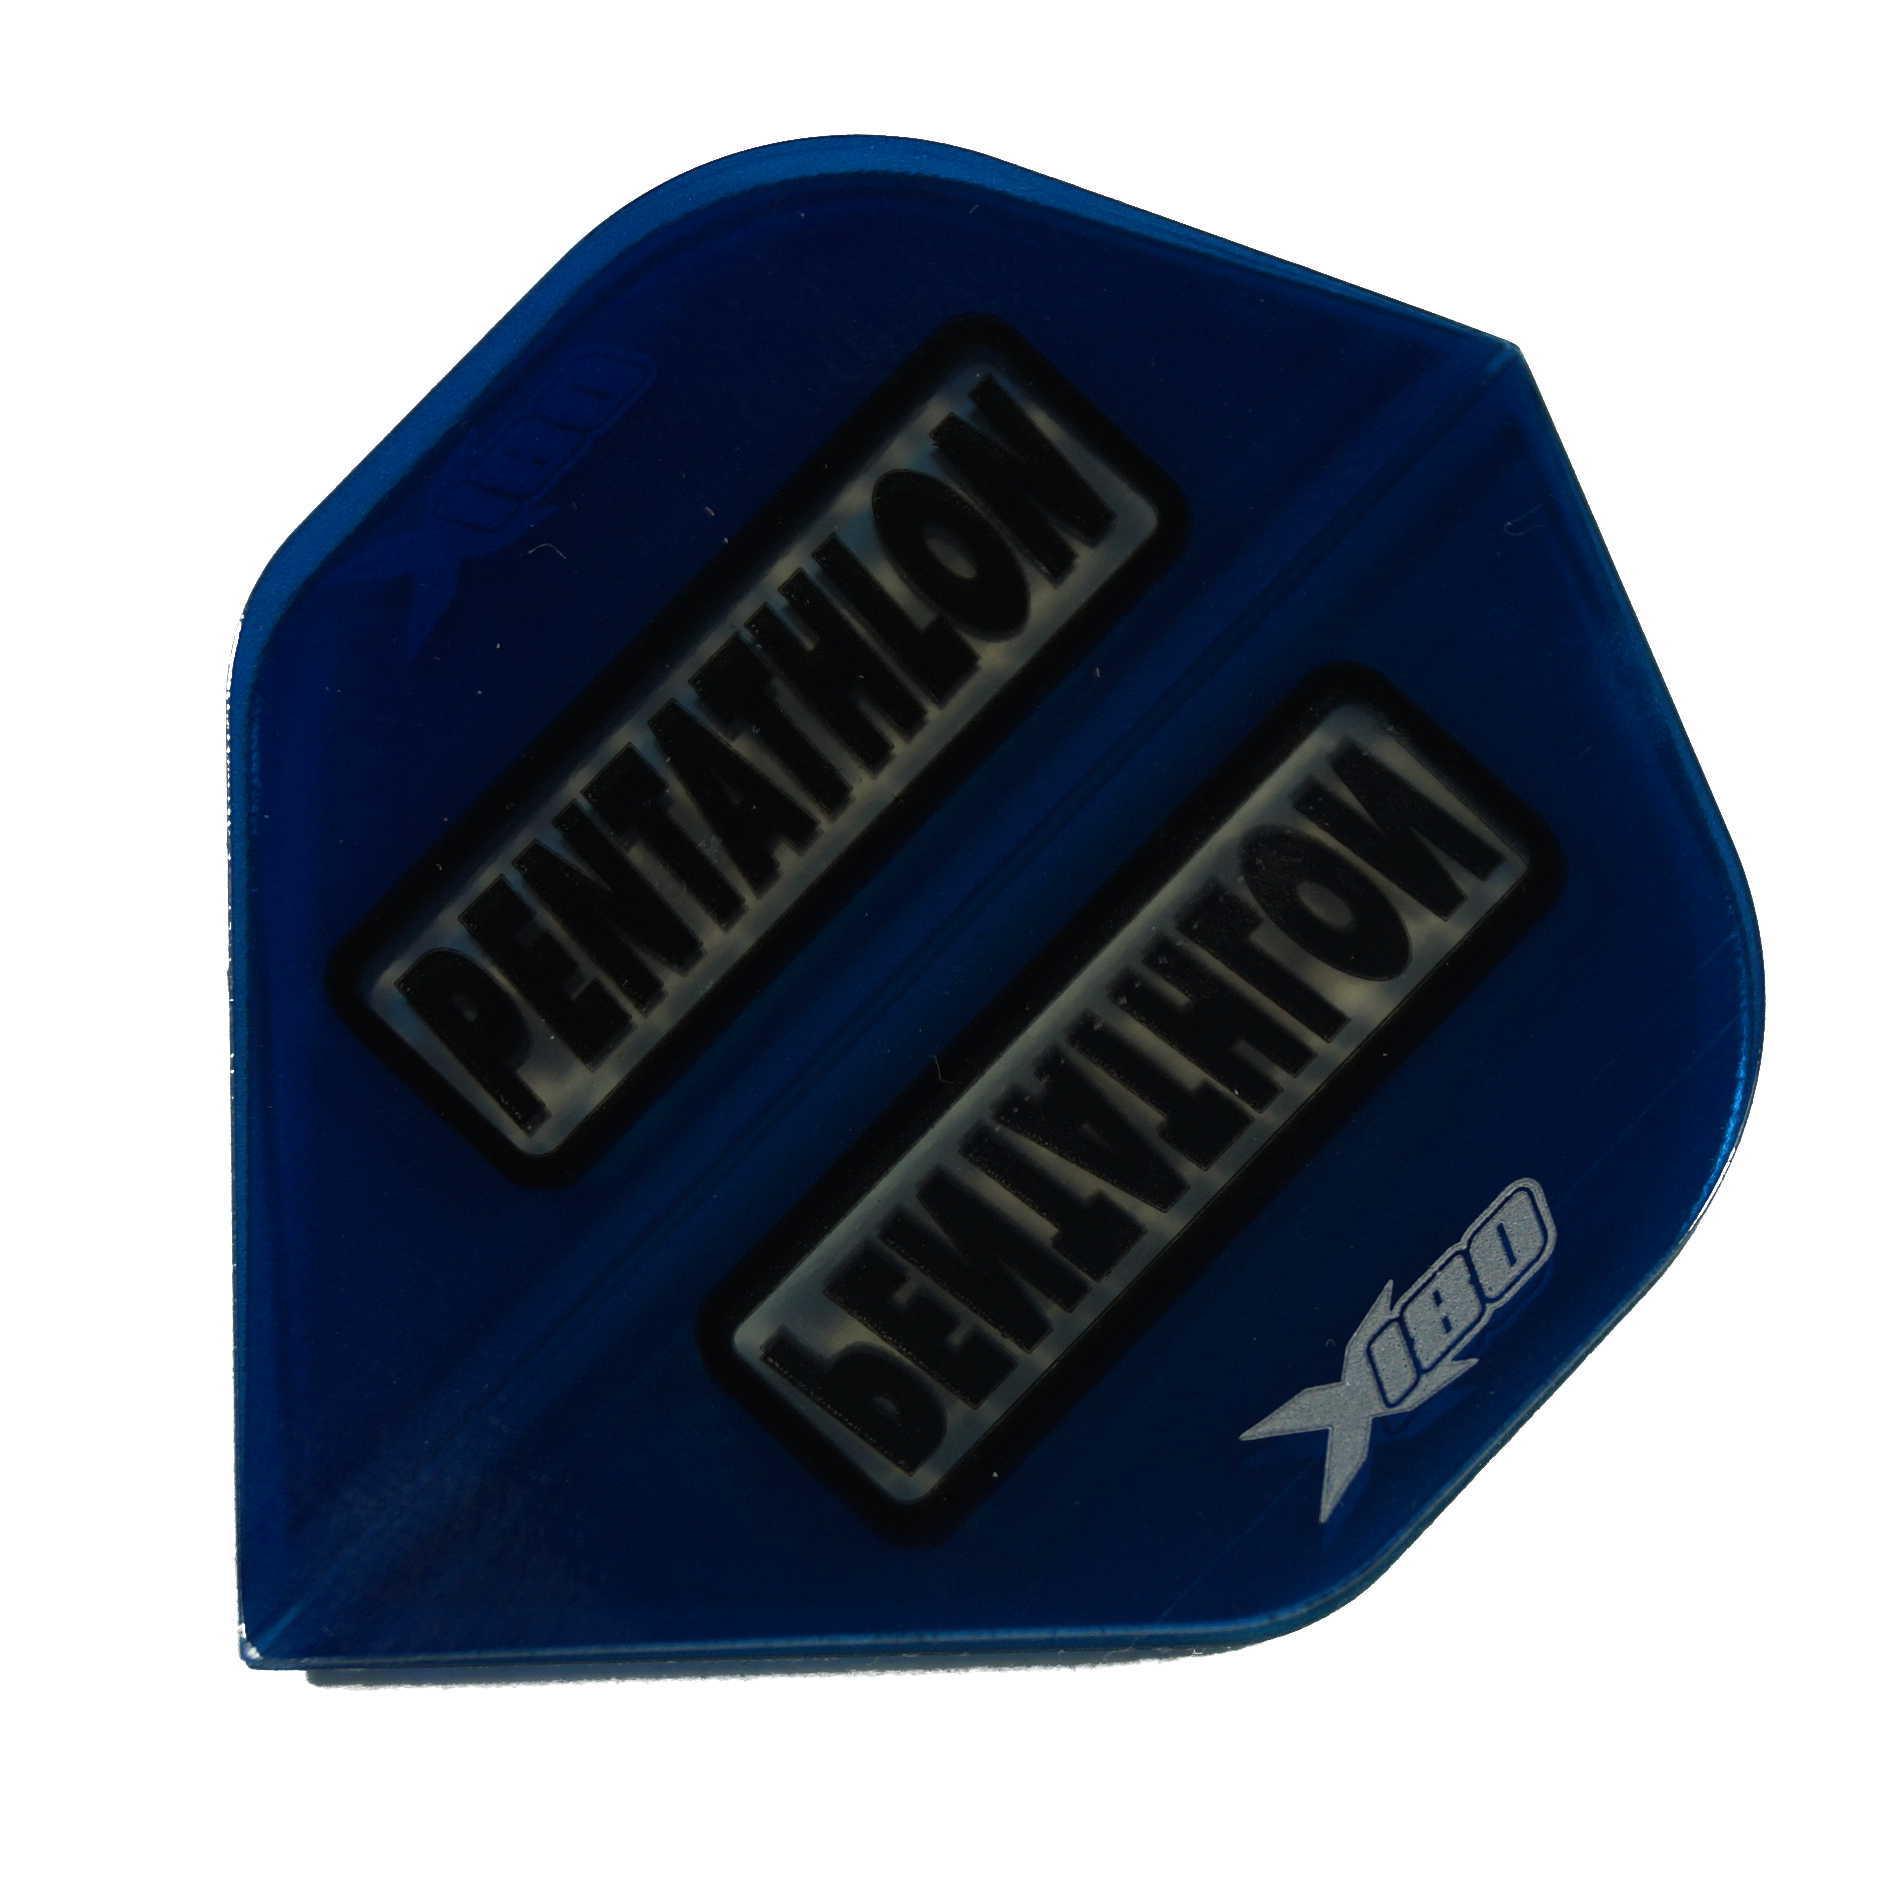 Pentathlon Flights X180 blau-transp. Standard